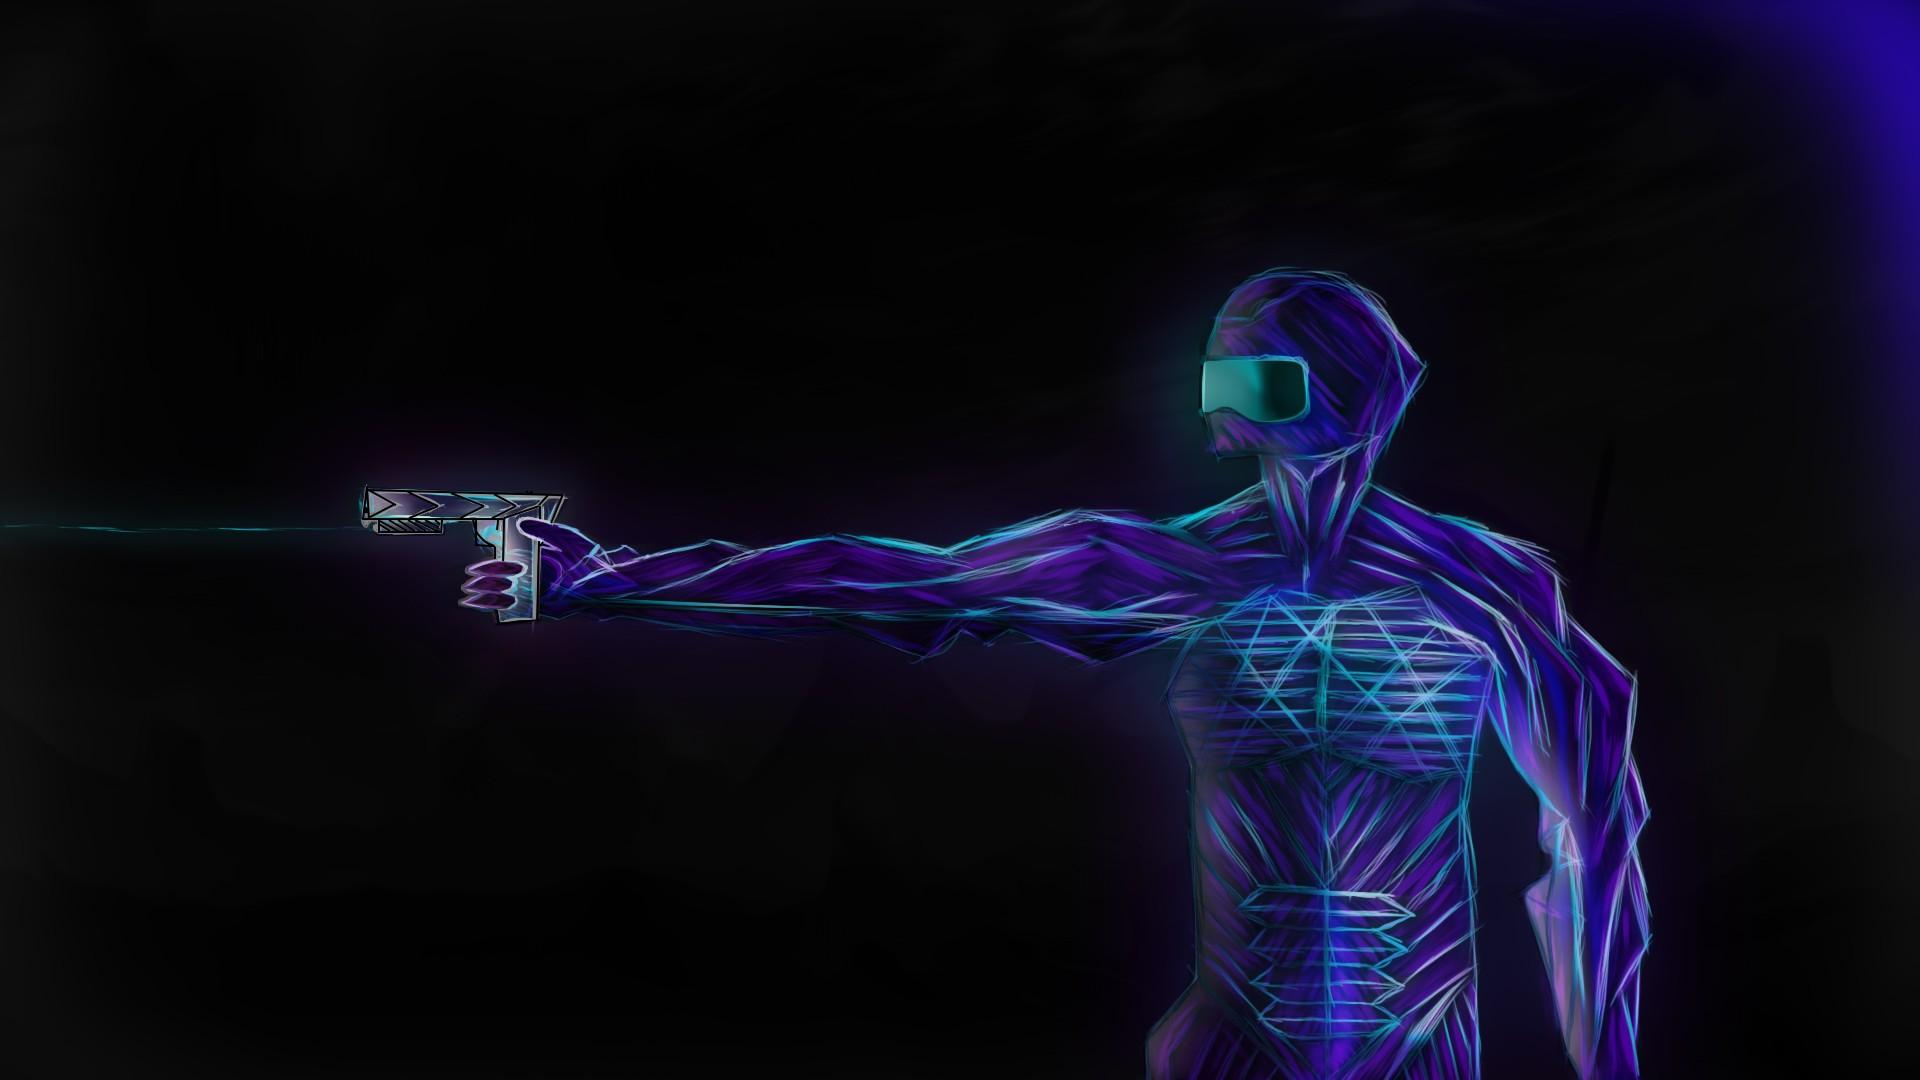 wallpaper : drawing, neon, blue, futuristic armor, soft shading